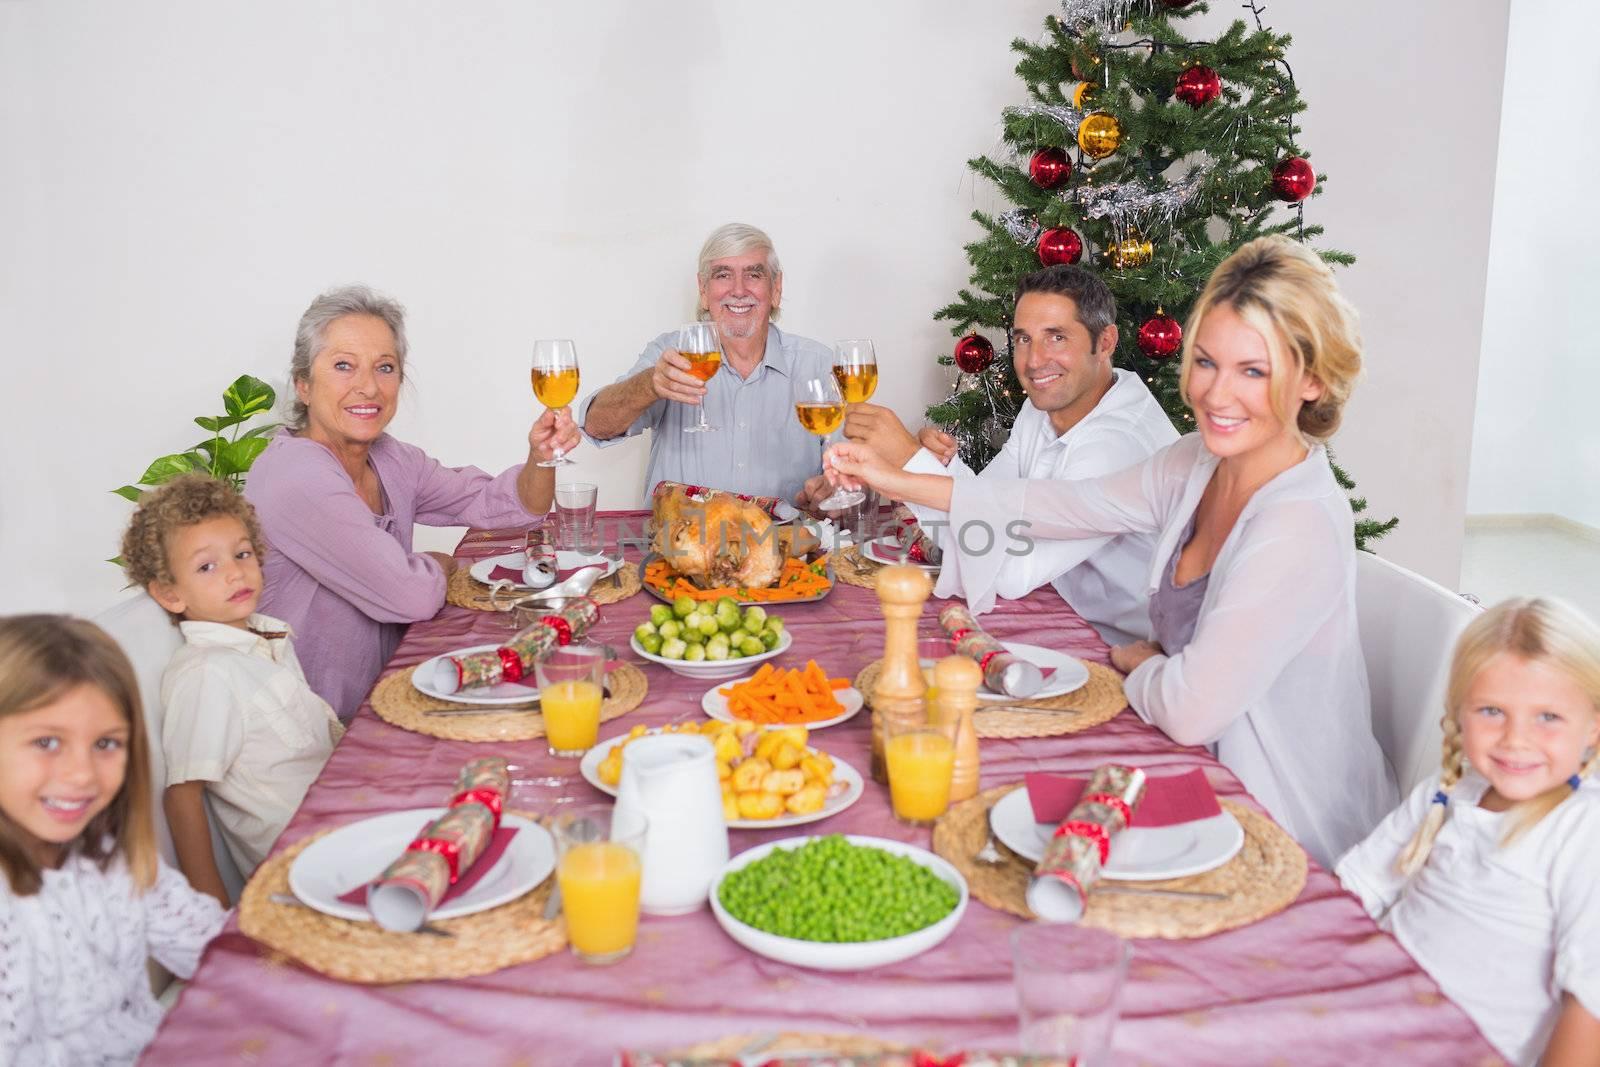 Family raising their glasses at christmas at dinner